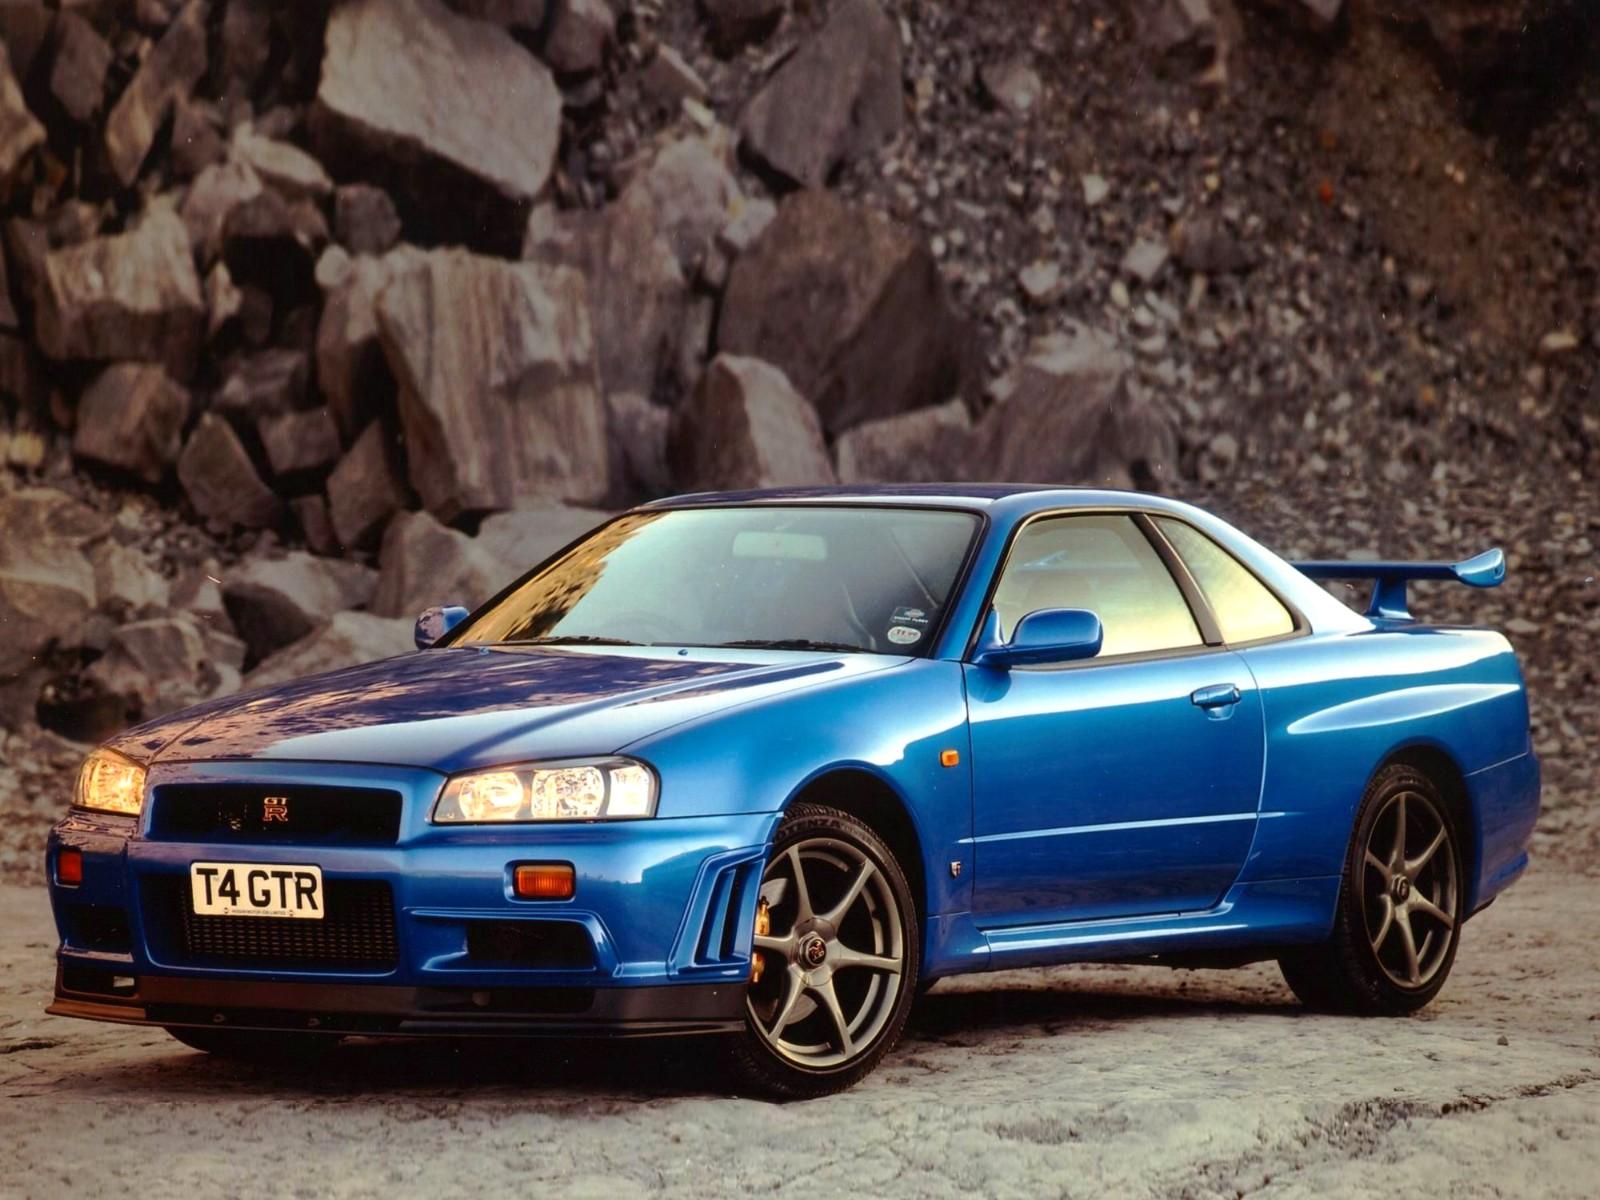 Nissan Skyline R34 GTR VSPEC II image  Automotive Enthusiasts